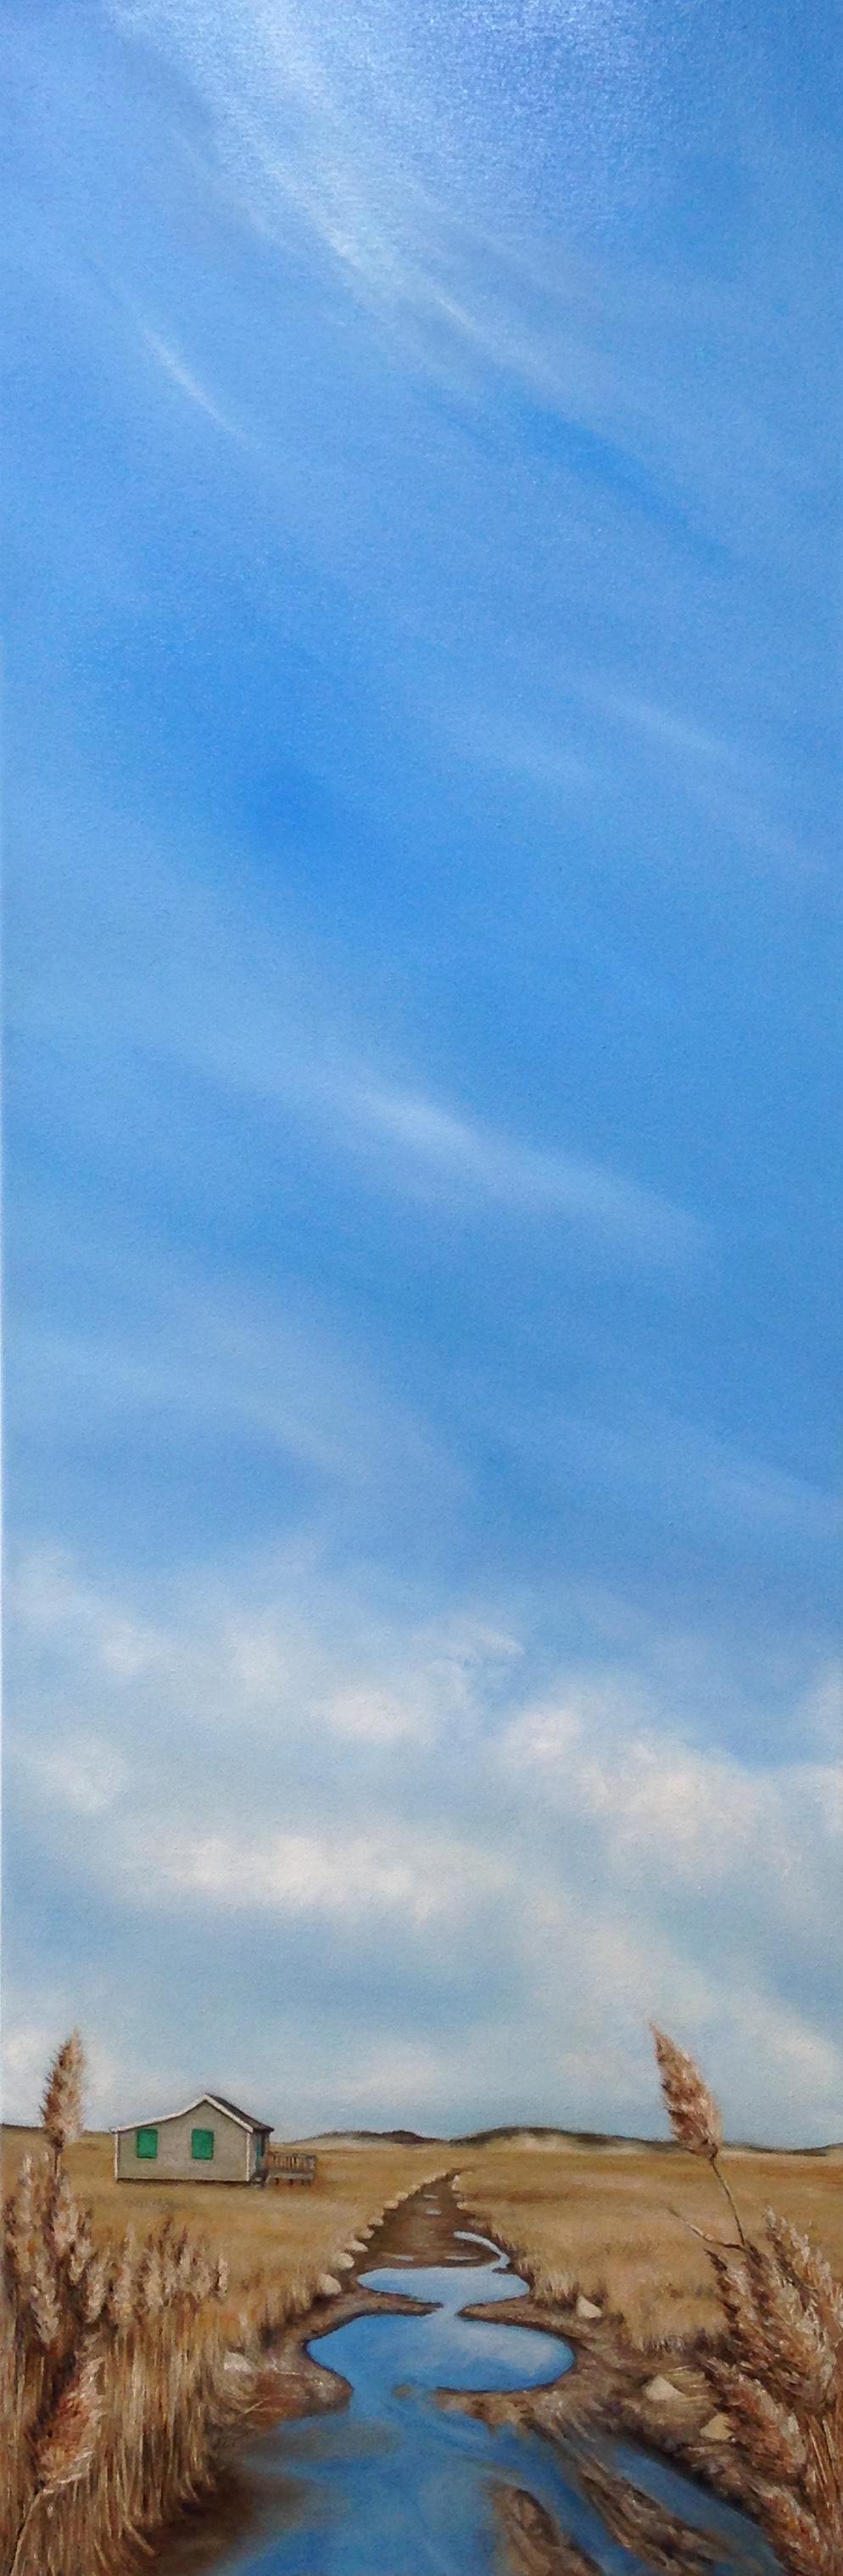 leonielittle-lex_cloudsovernavigation.JPG